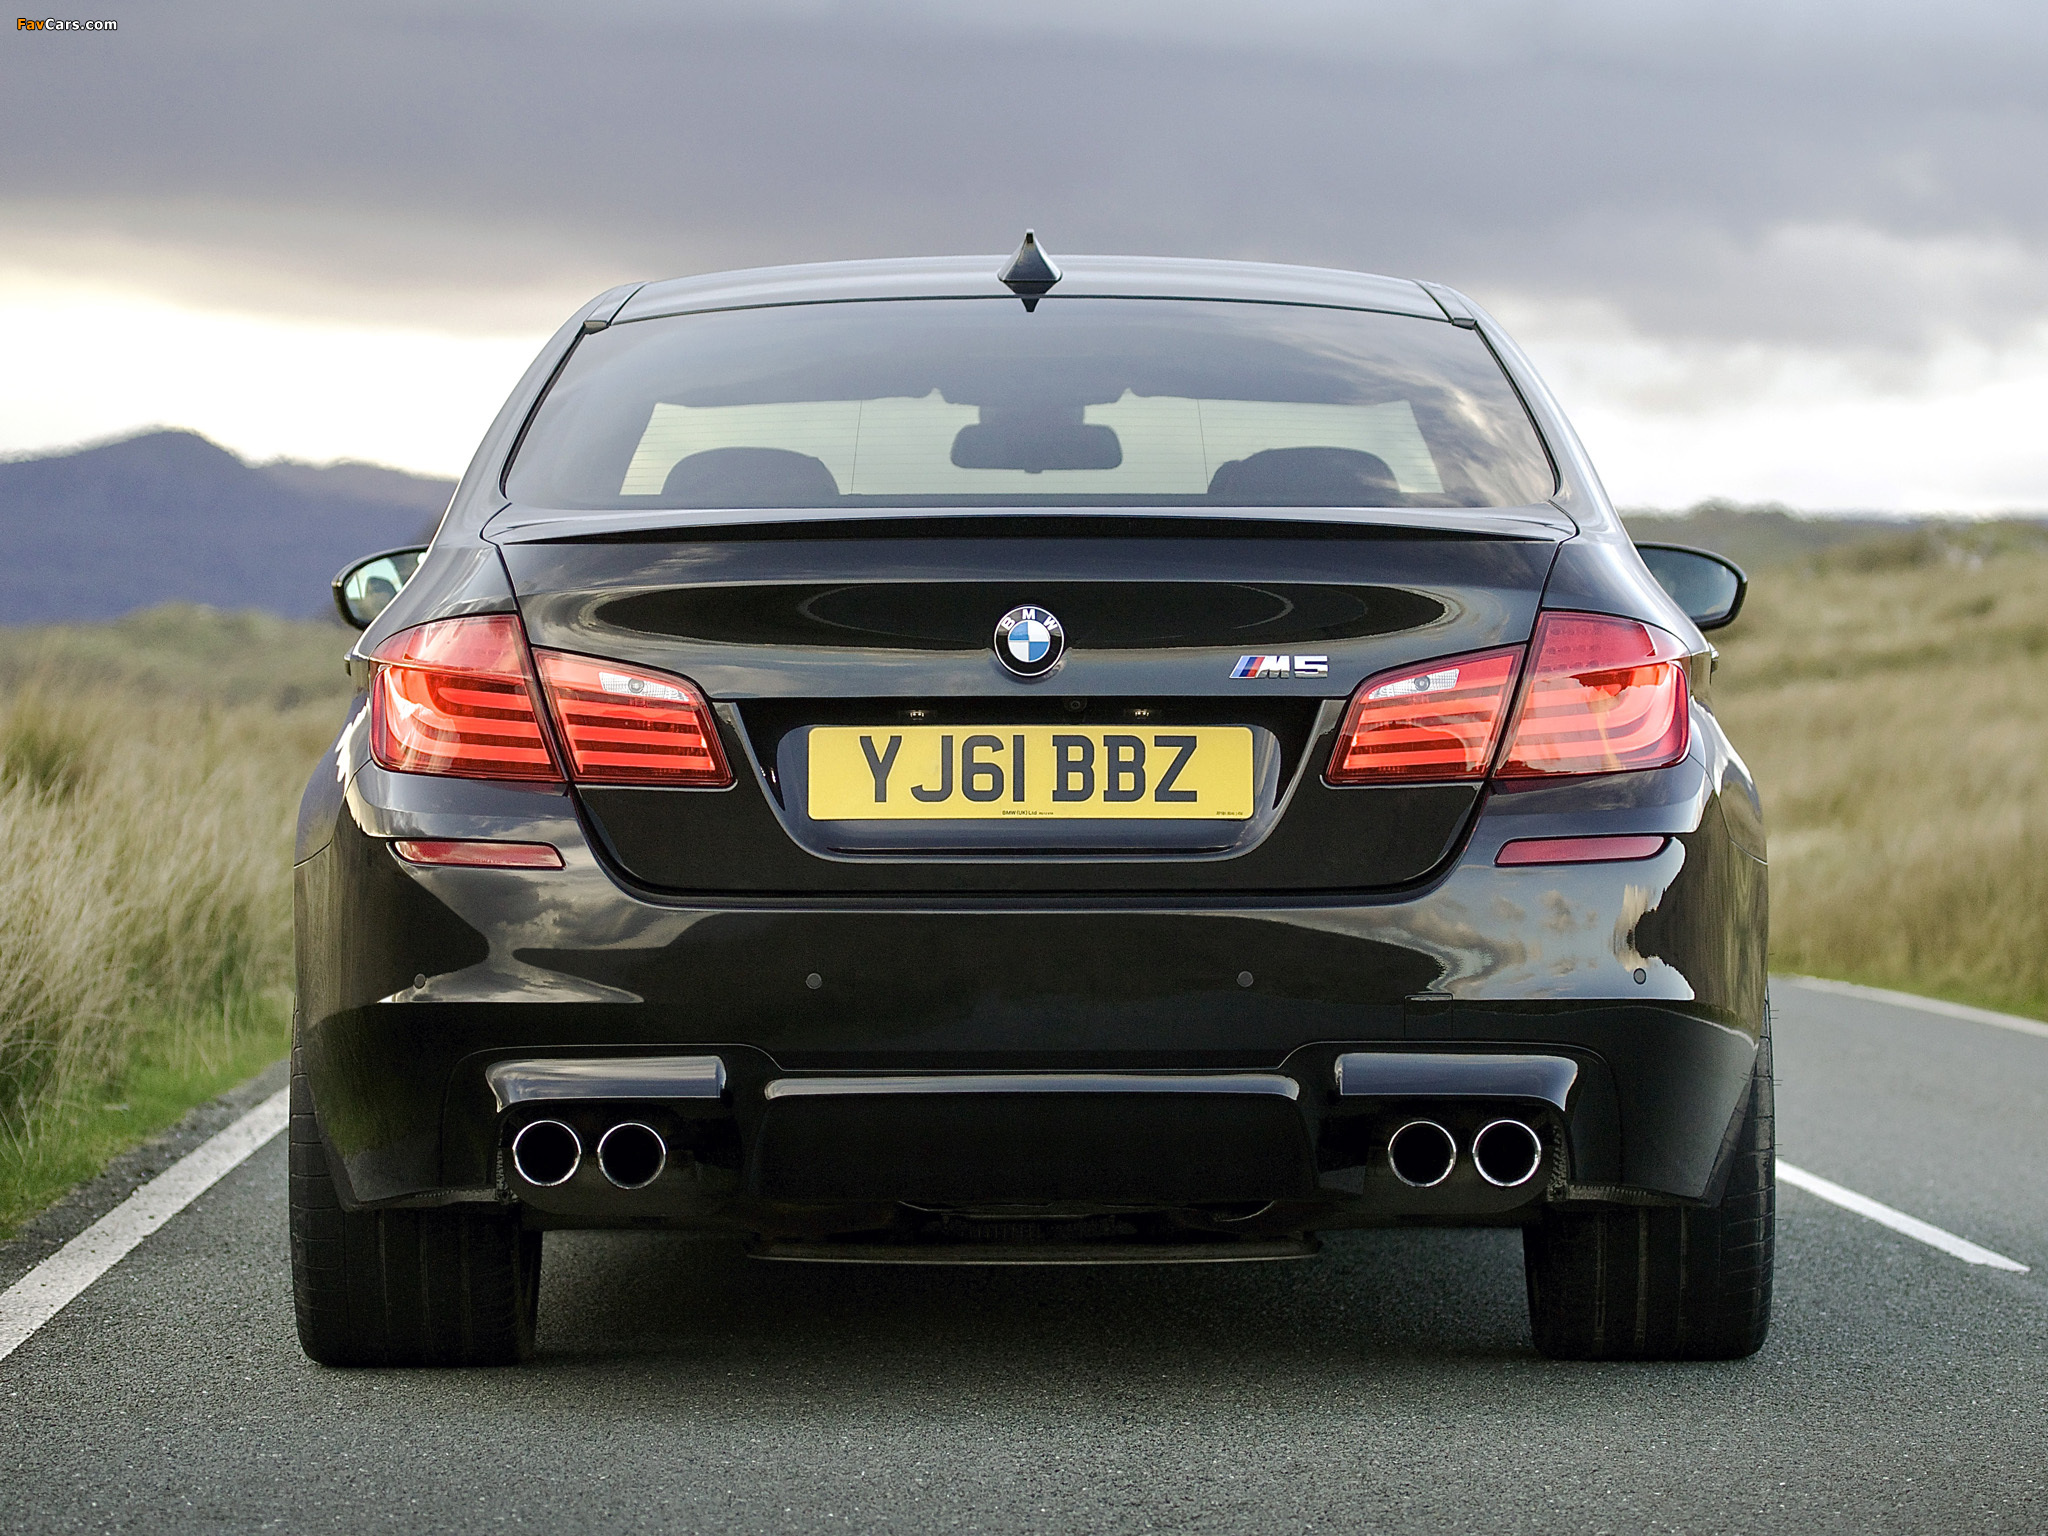 BMW M5 UK-spec (F10) 2011 wallpapers (2048x1536)